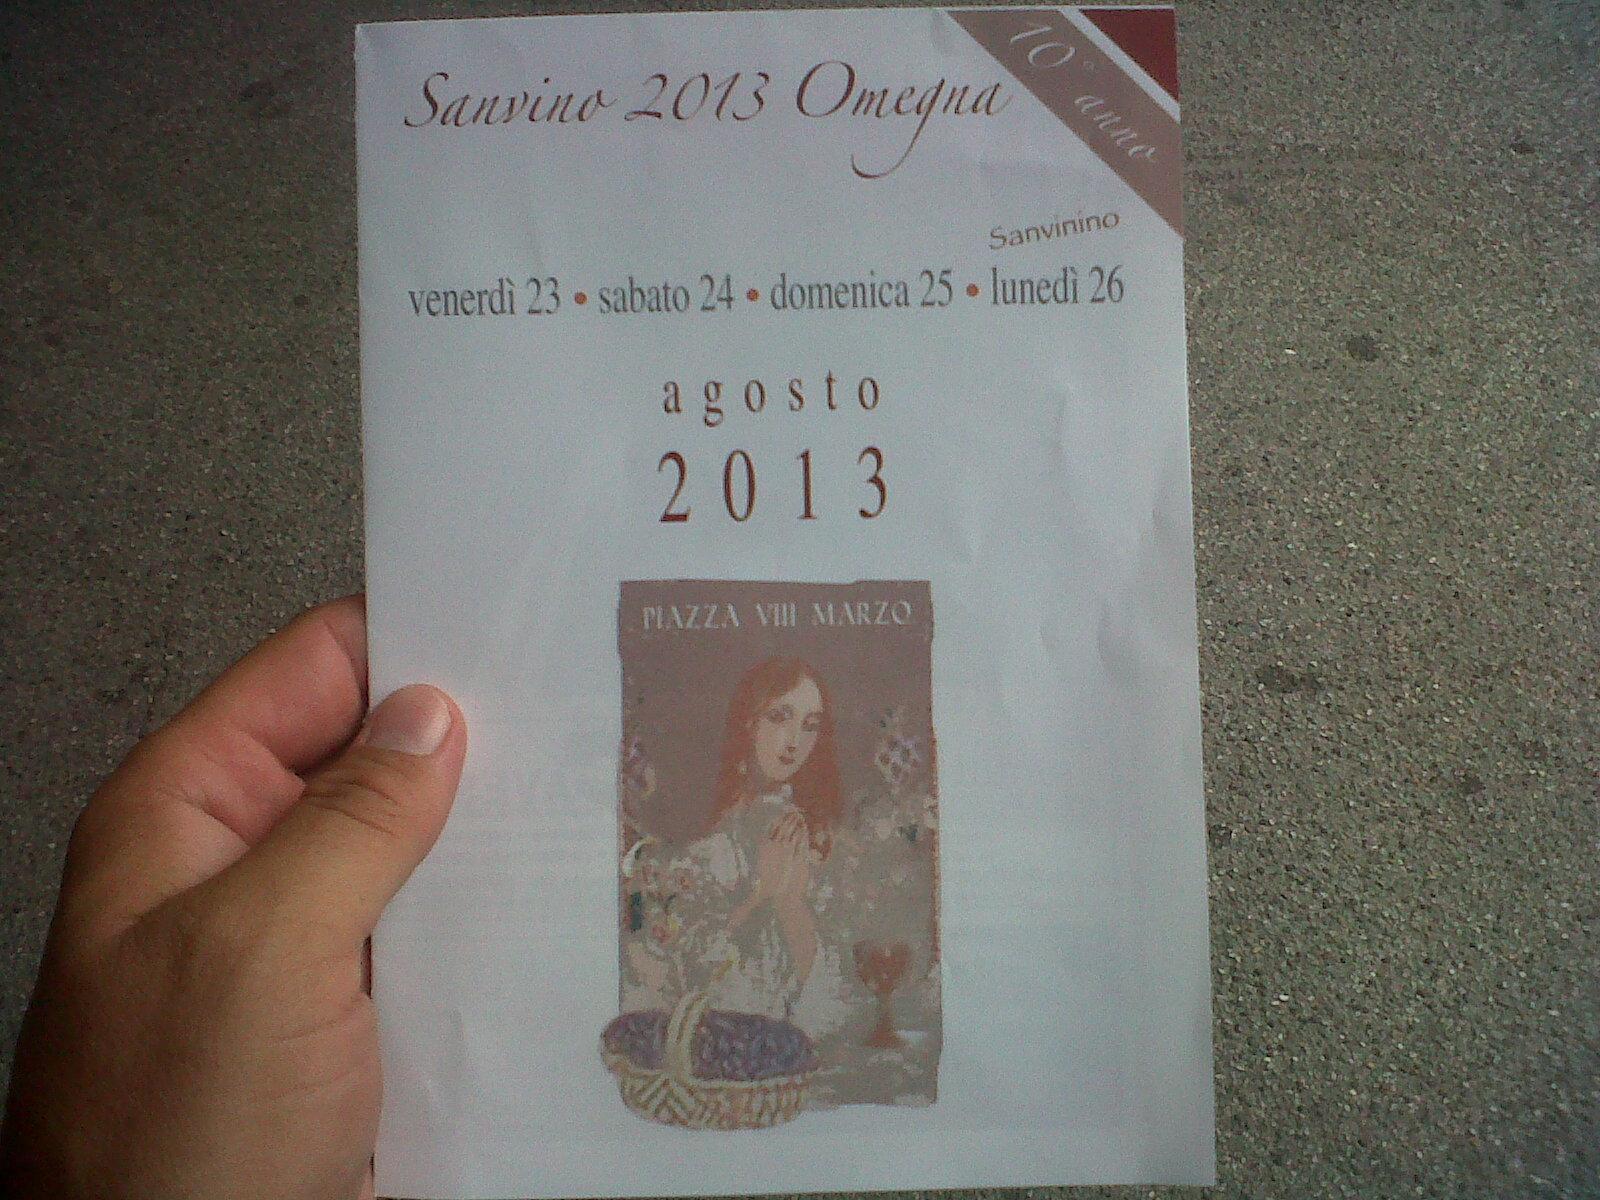 Copertina depliant Sanvino 2013